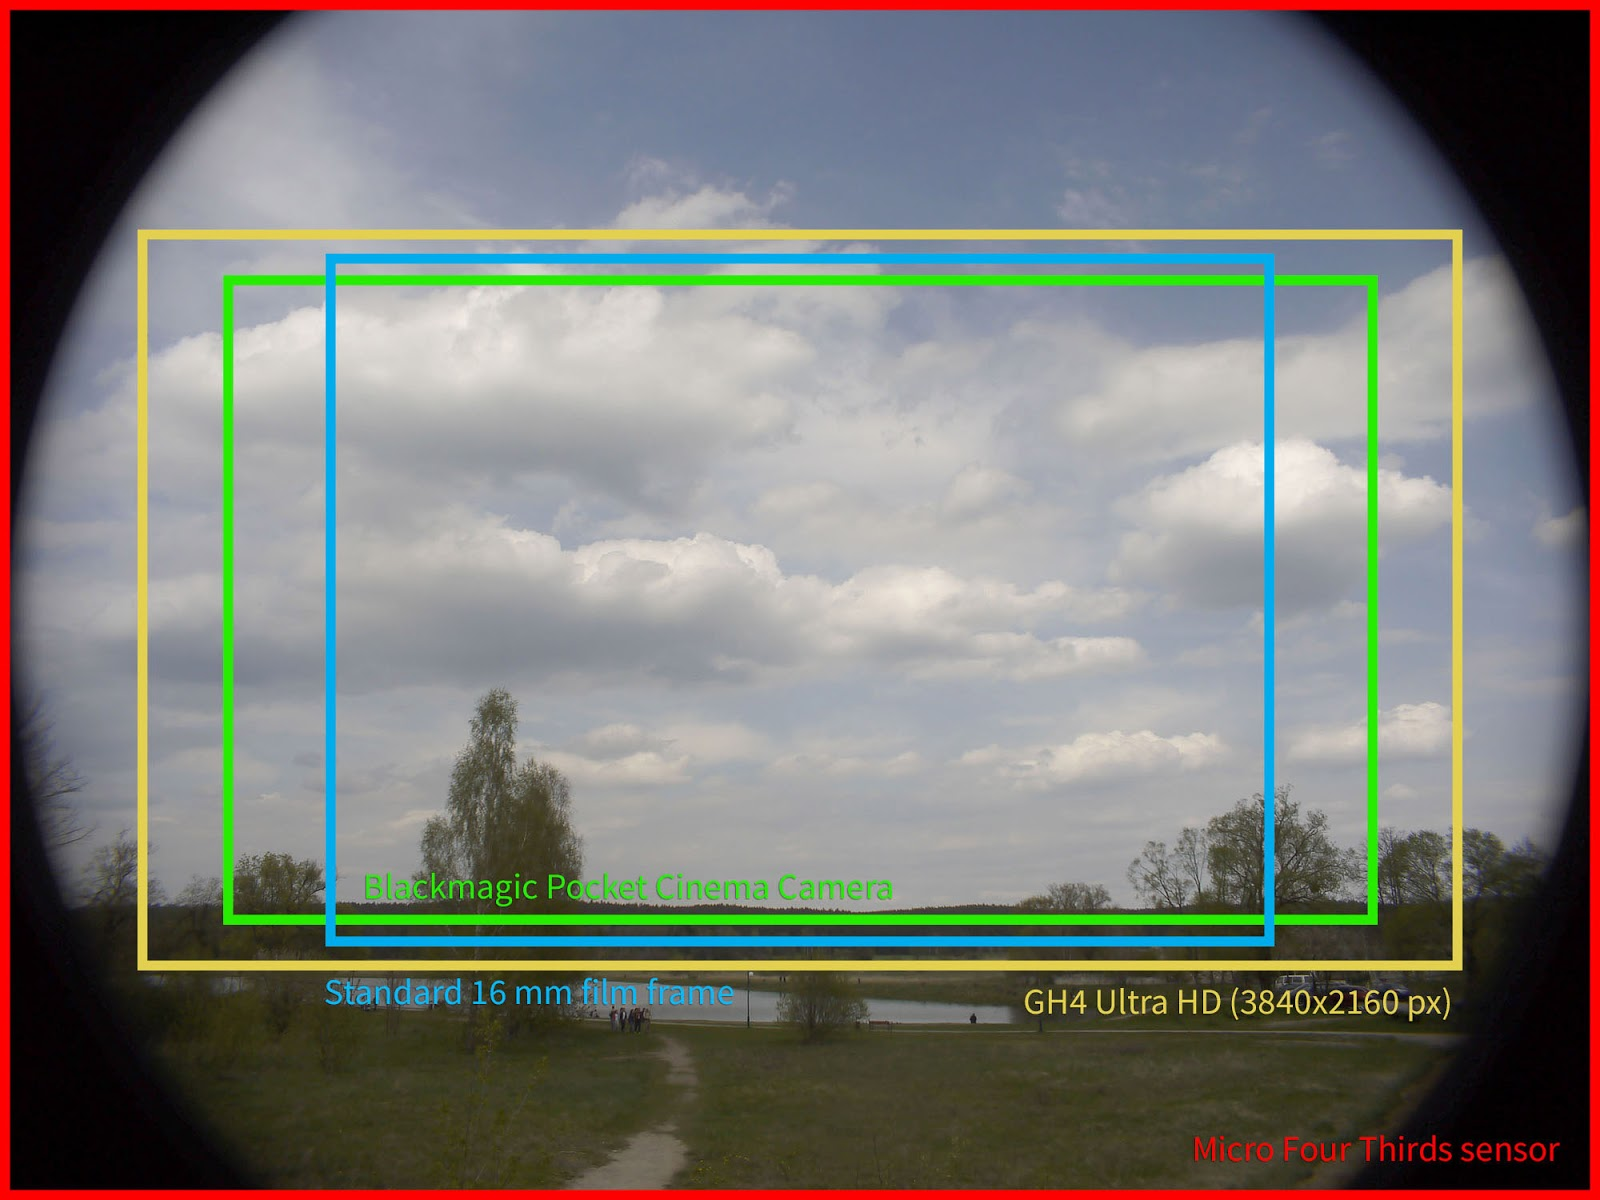 Cosmicar 12.5/1.9 @8 - MFT, BMPCC, GH4 UltraHD sensor coverage